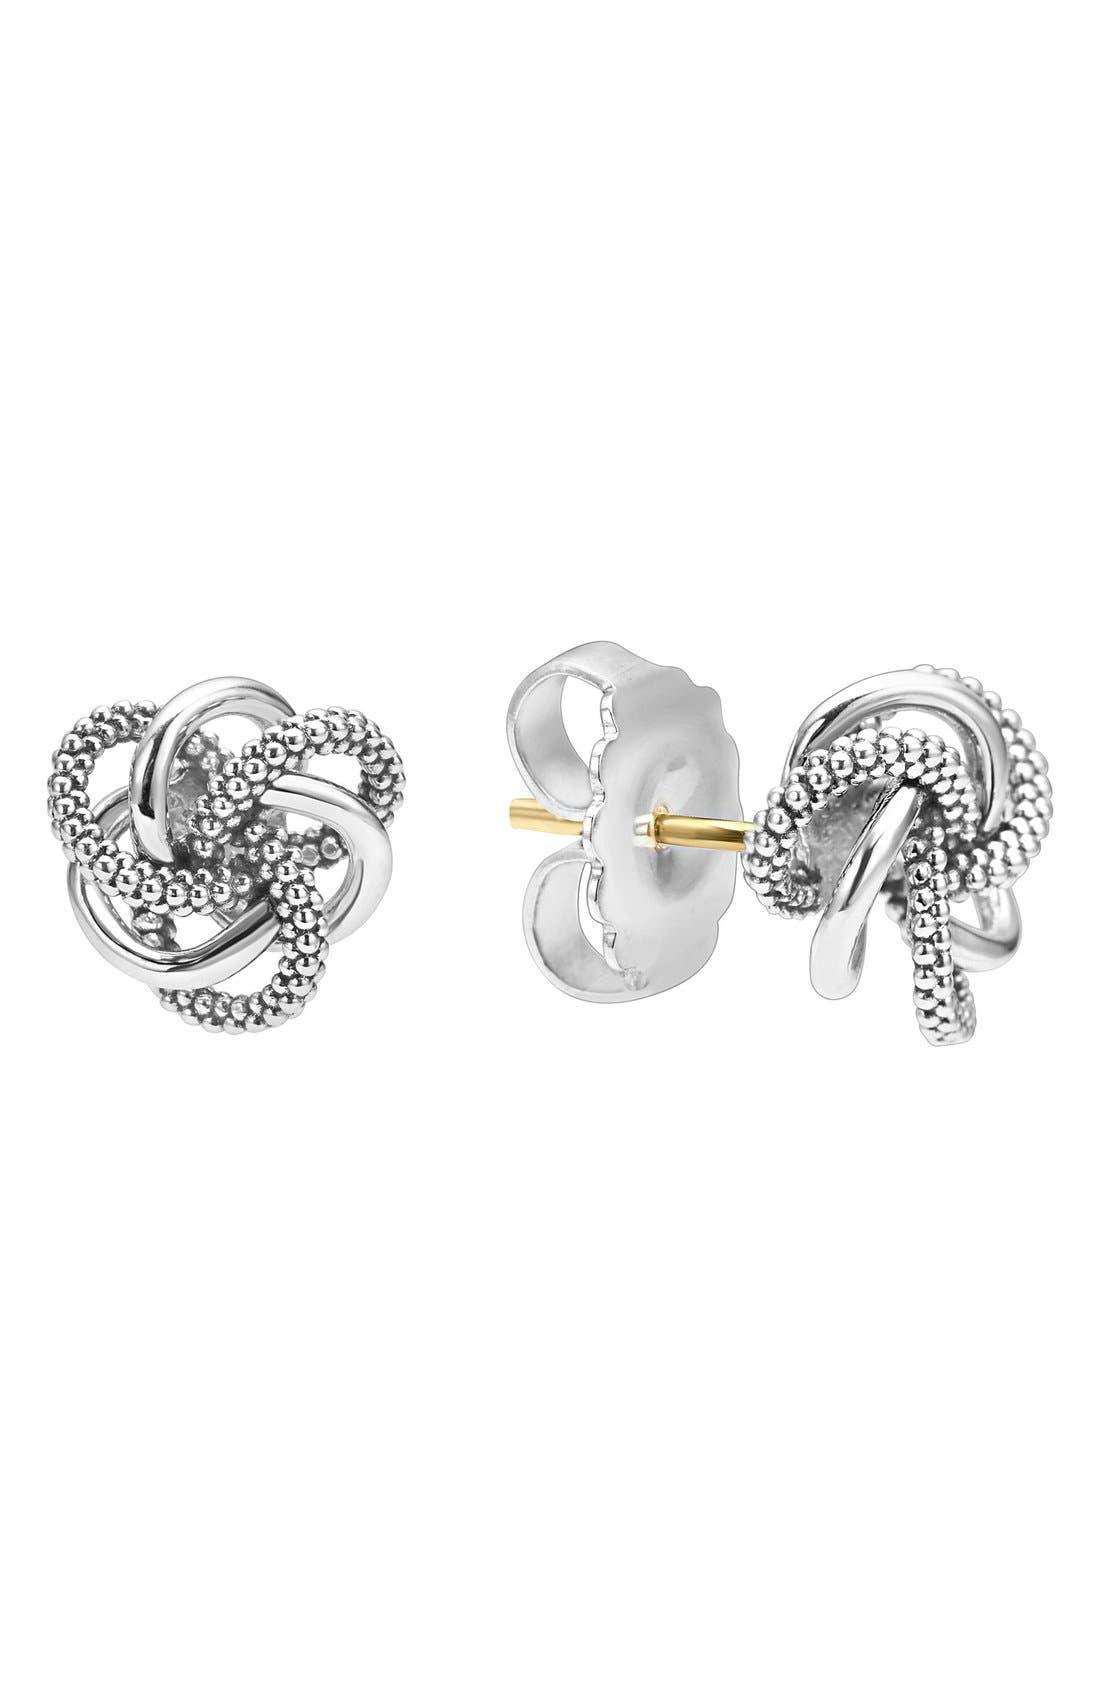 LAGOS Love Knot Sterling Silver Stud Earrings